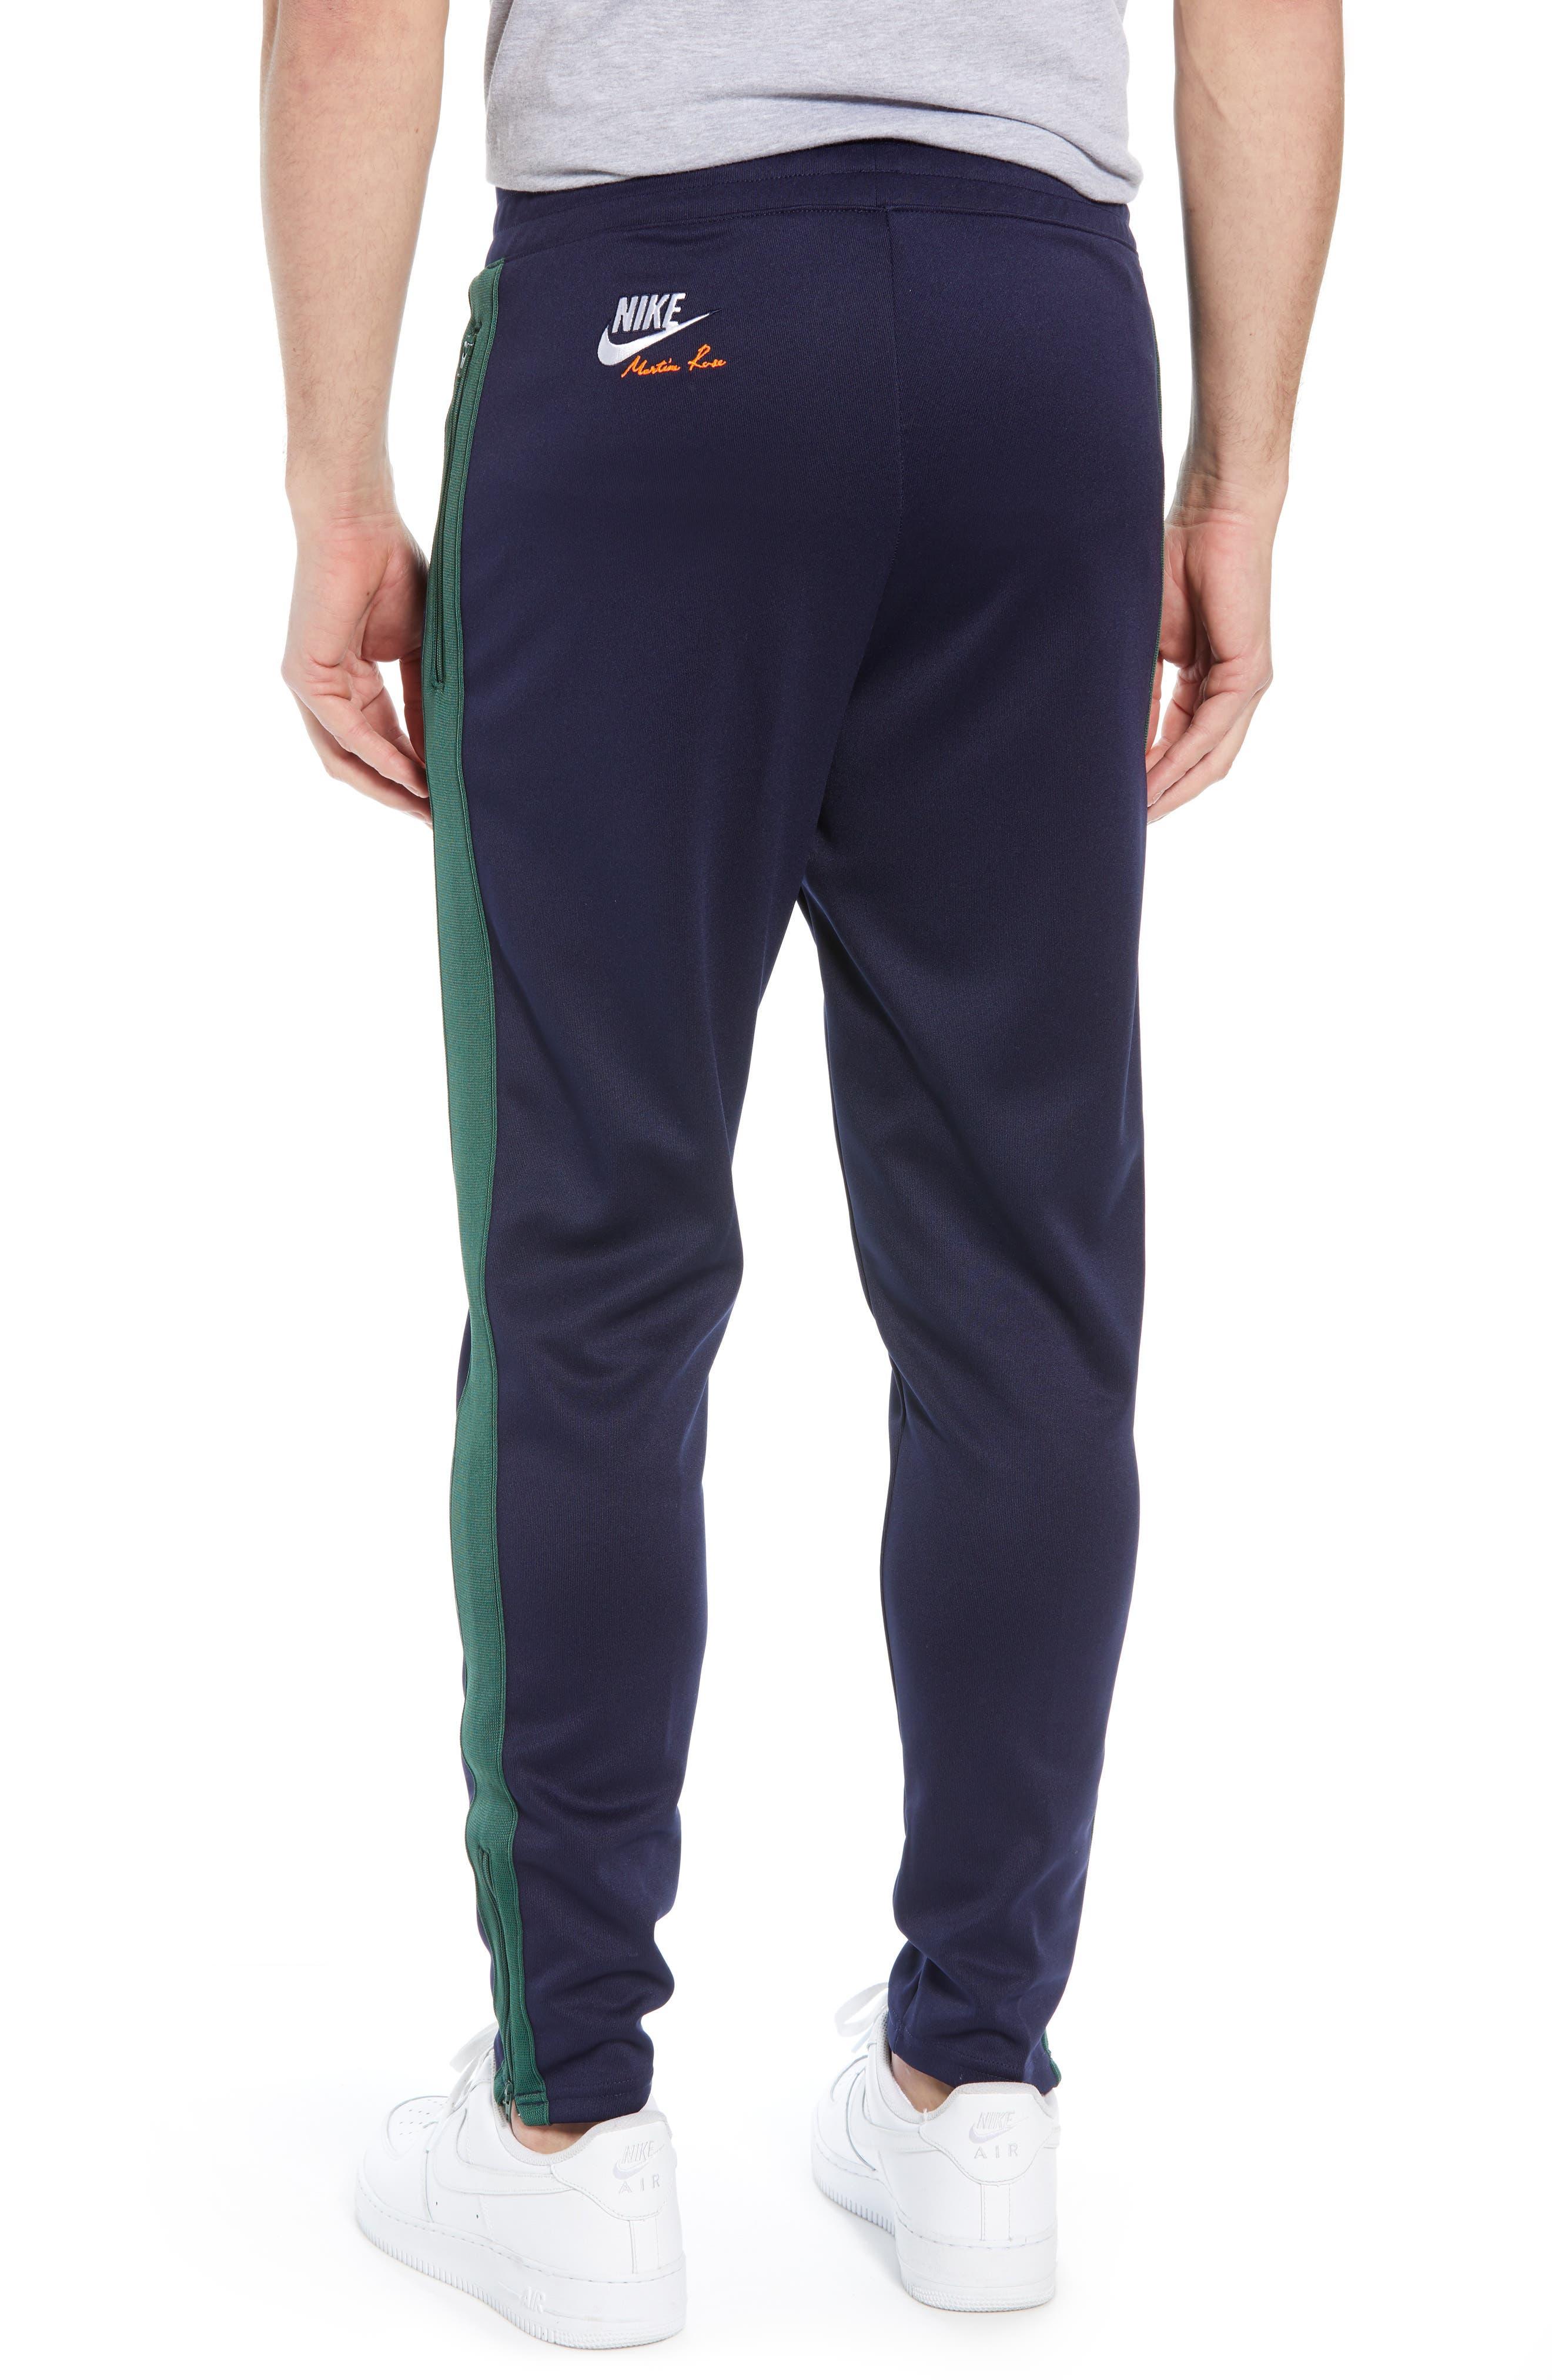 NIKE,                             x Martine Rose Men's Track Pants,                             Alternate thumbnail 2, color,                             BLACKENED BLUE/ FIR